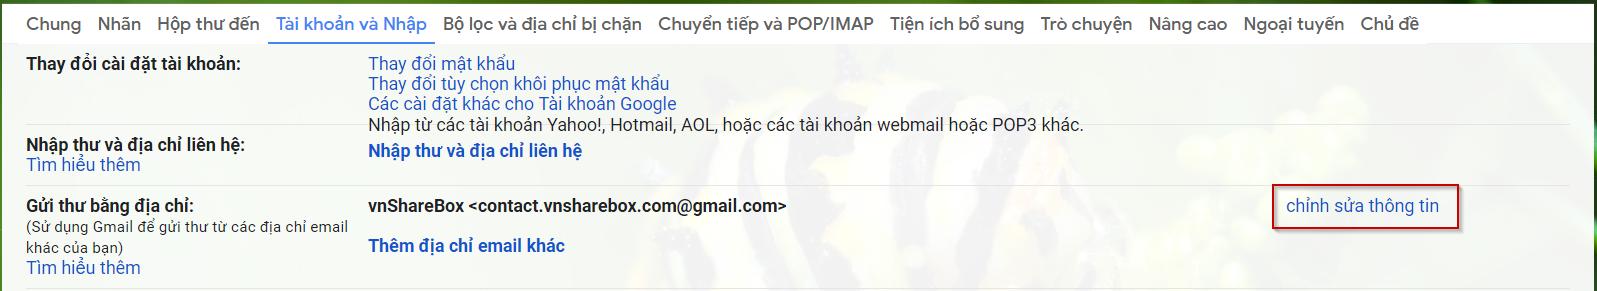 cach-thay-doi-ten-gmail-hien-thi-22-3